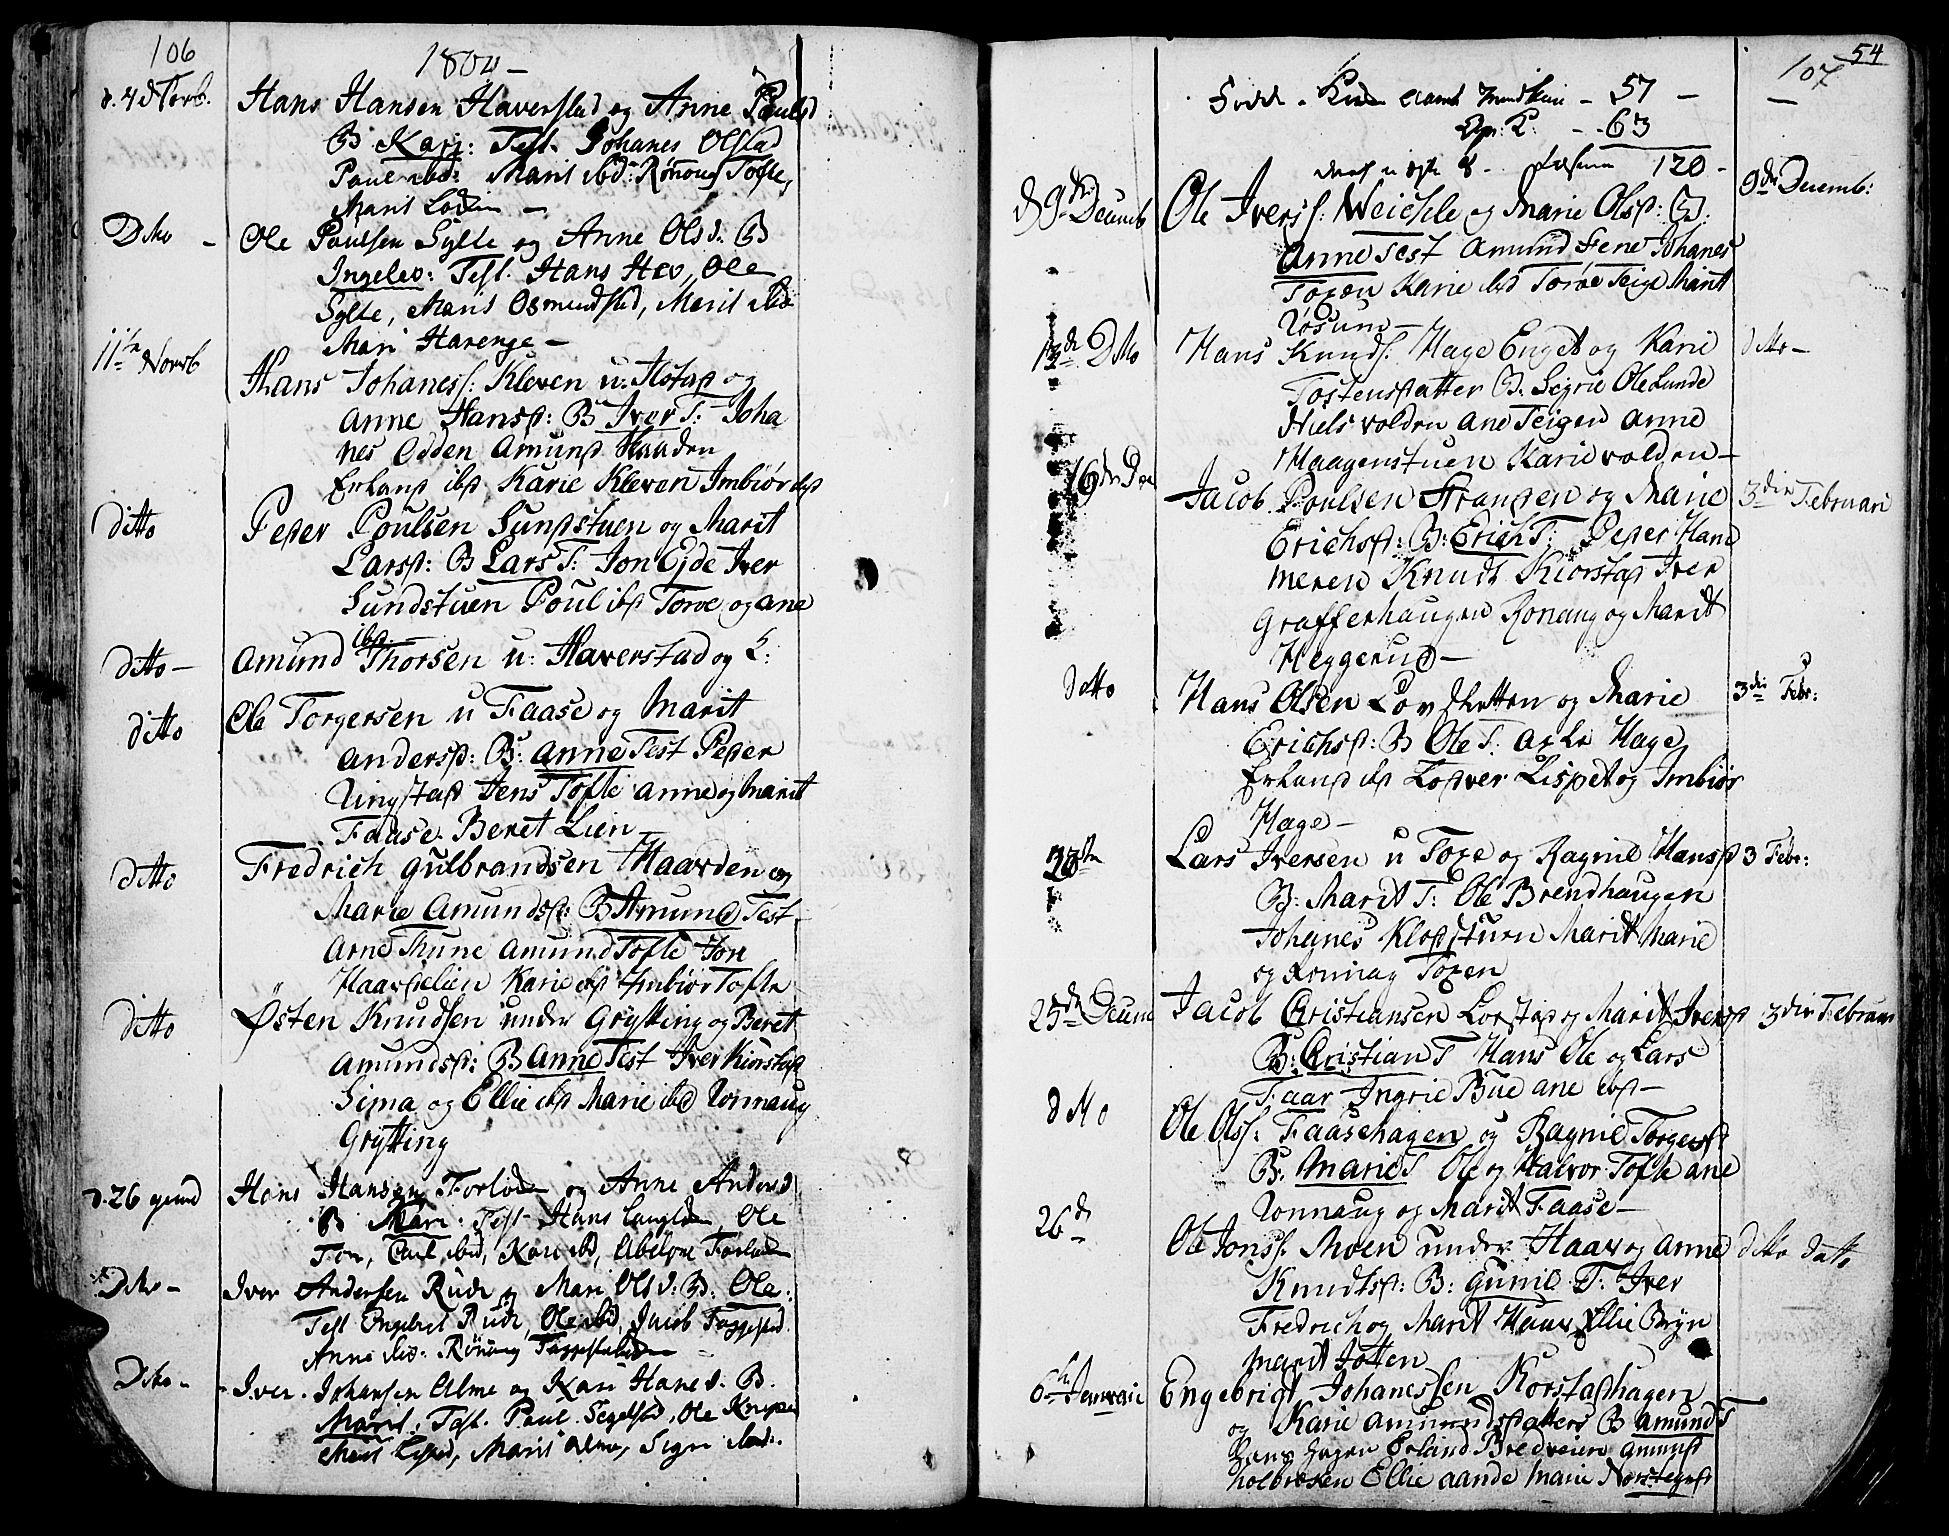 SAH, Fron prestekontor, H/Ha/Haa/L0001: Ministerialbok nr. 1, 1799-1816, s. 106-107